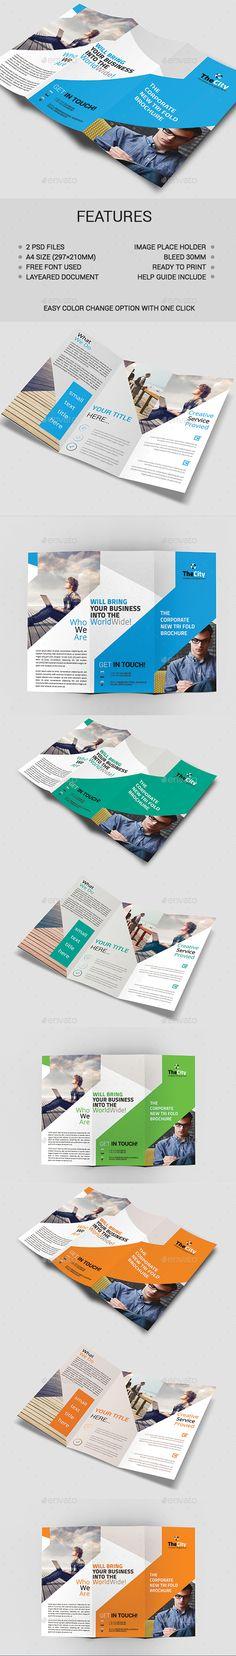 corporate brochure ロゴ クリエイティブ パンフレットのテンプレート